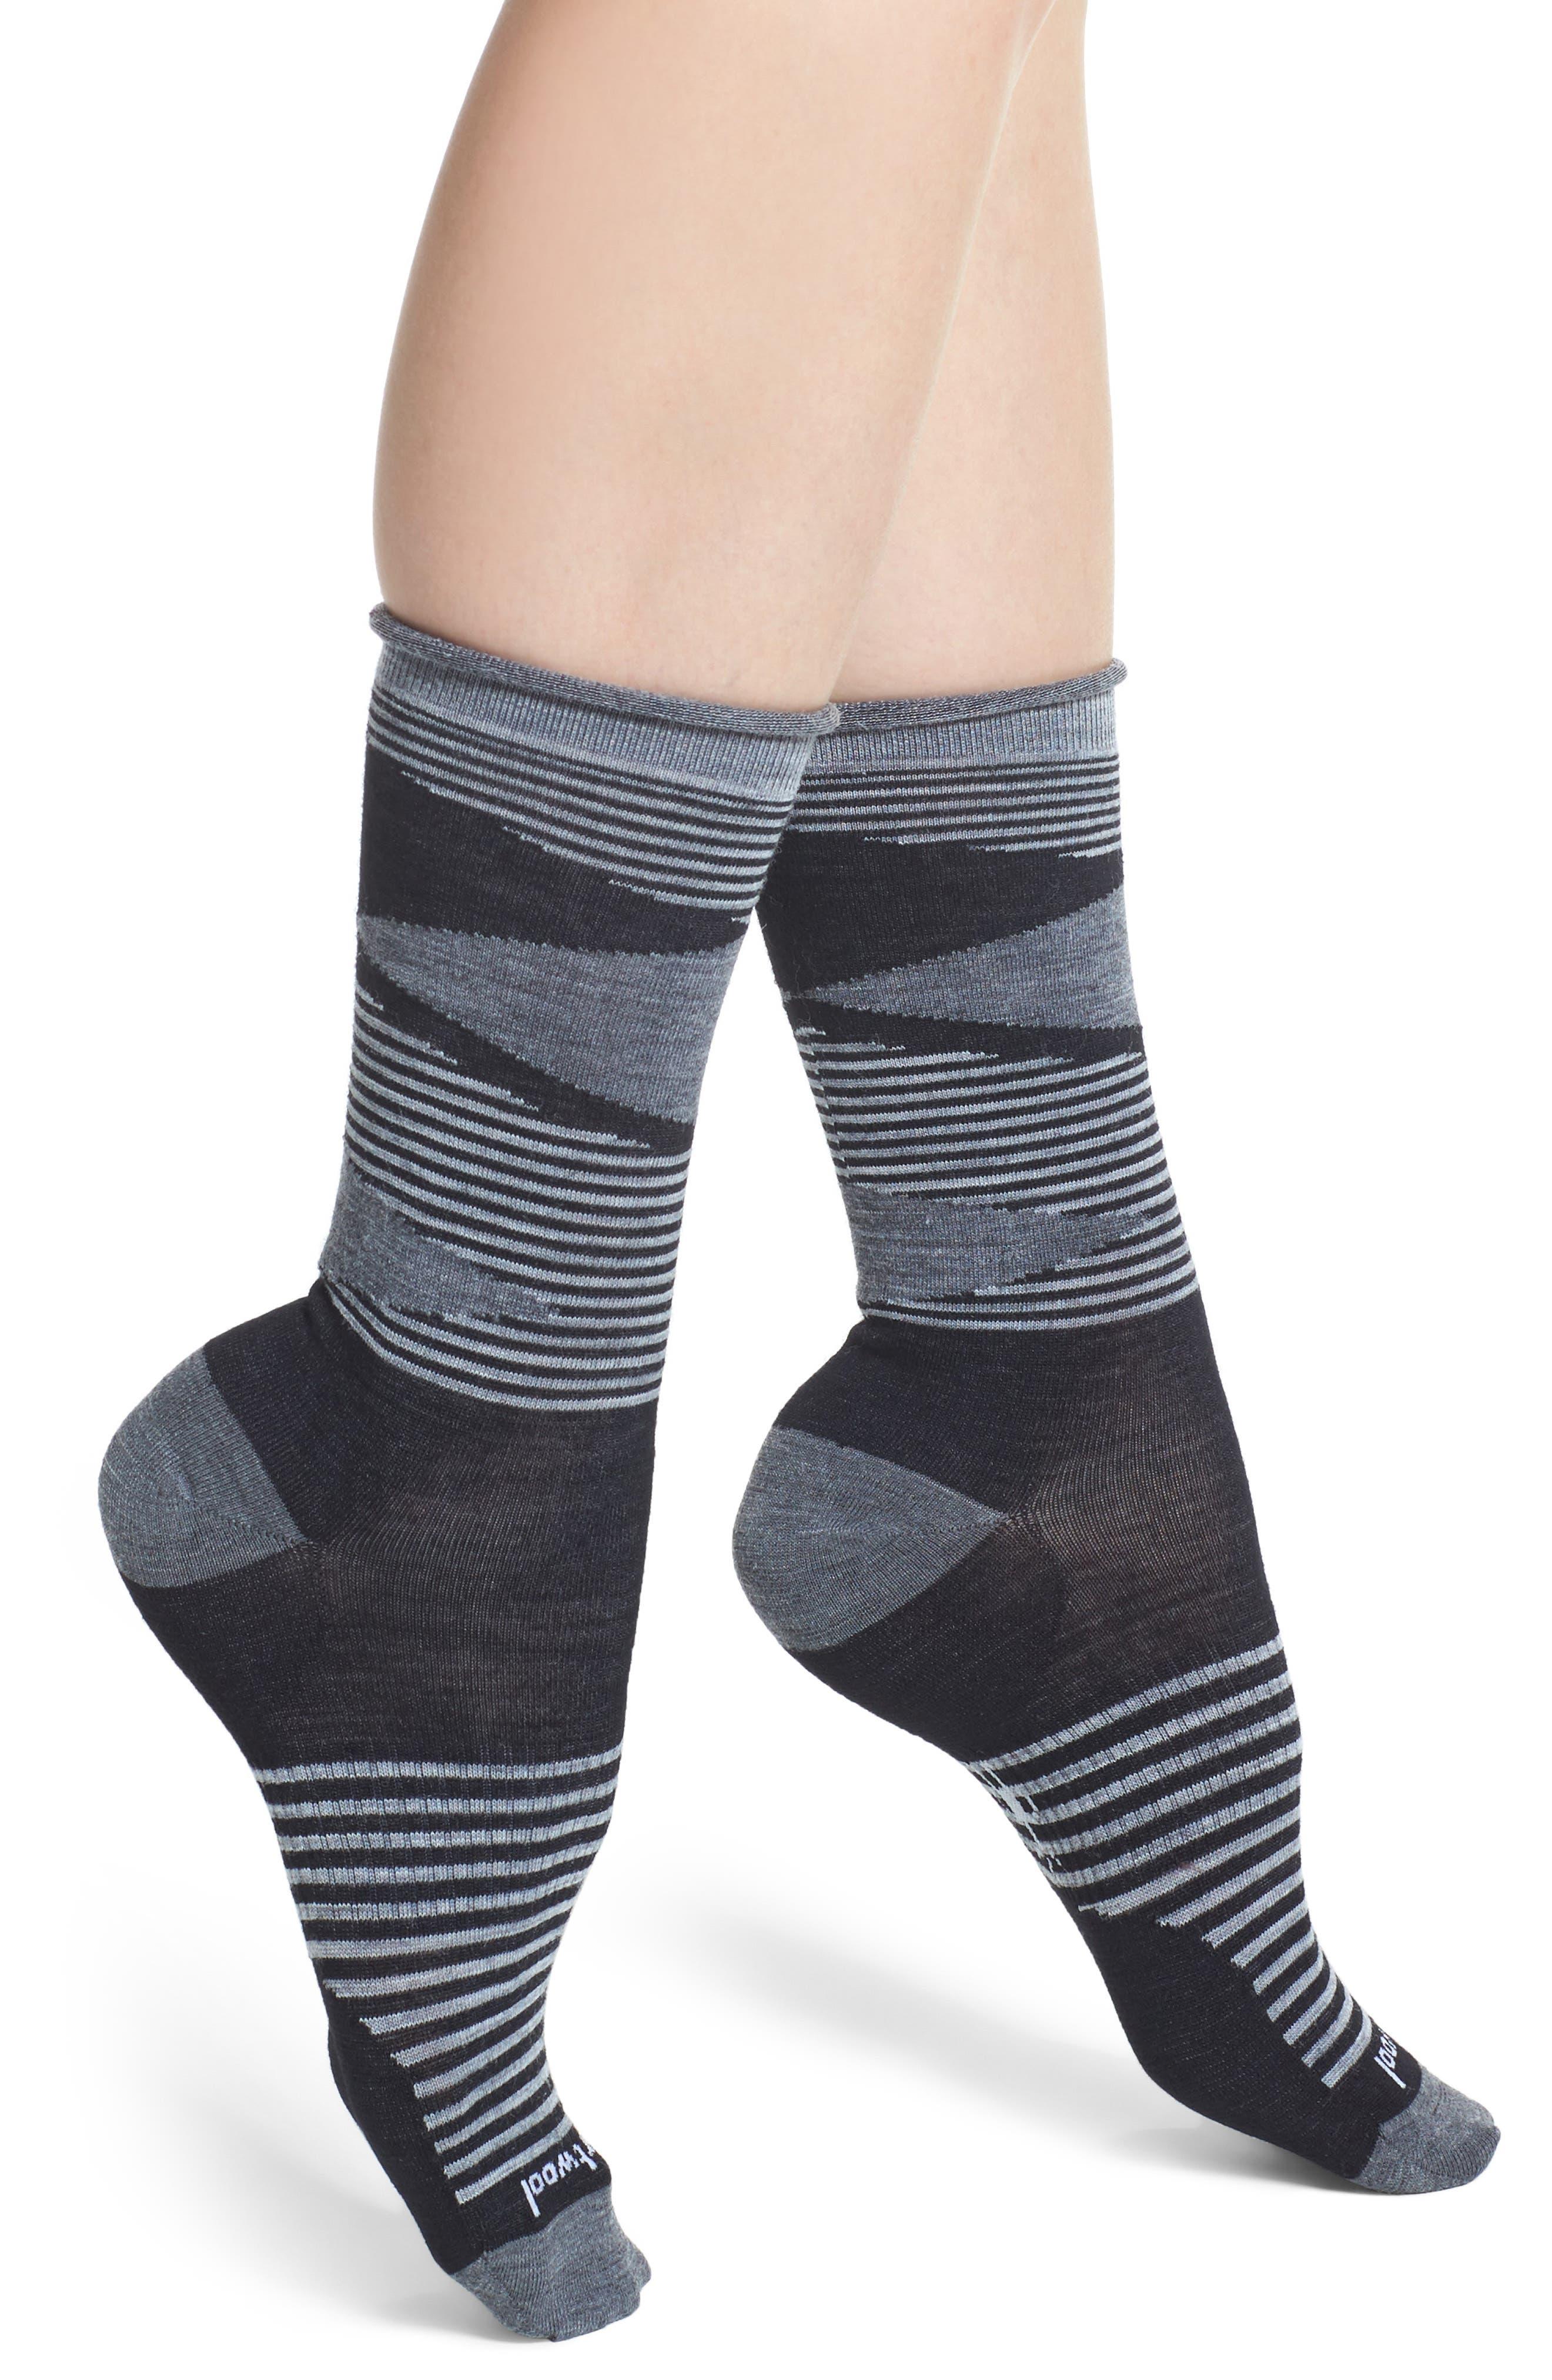 First Mate Crew Socks,                         Main,                         color, Black